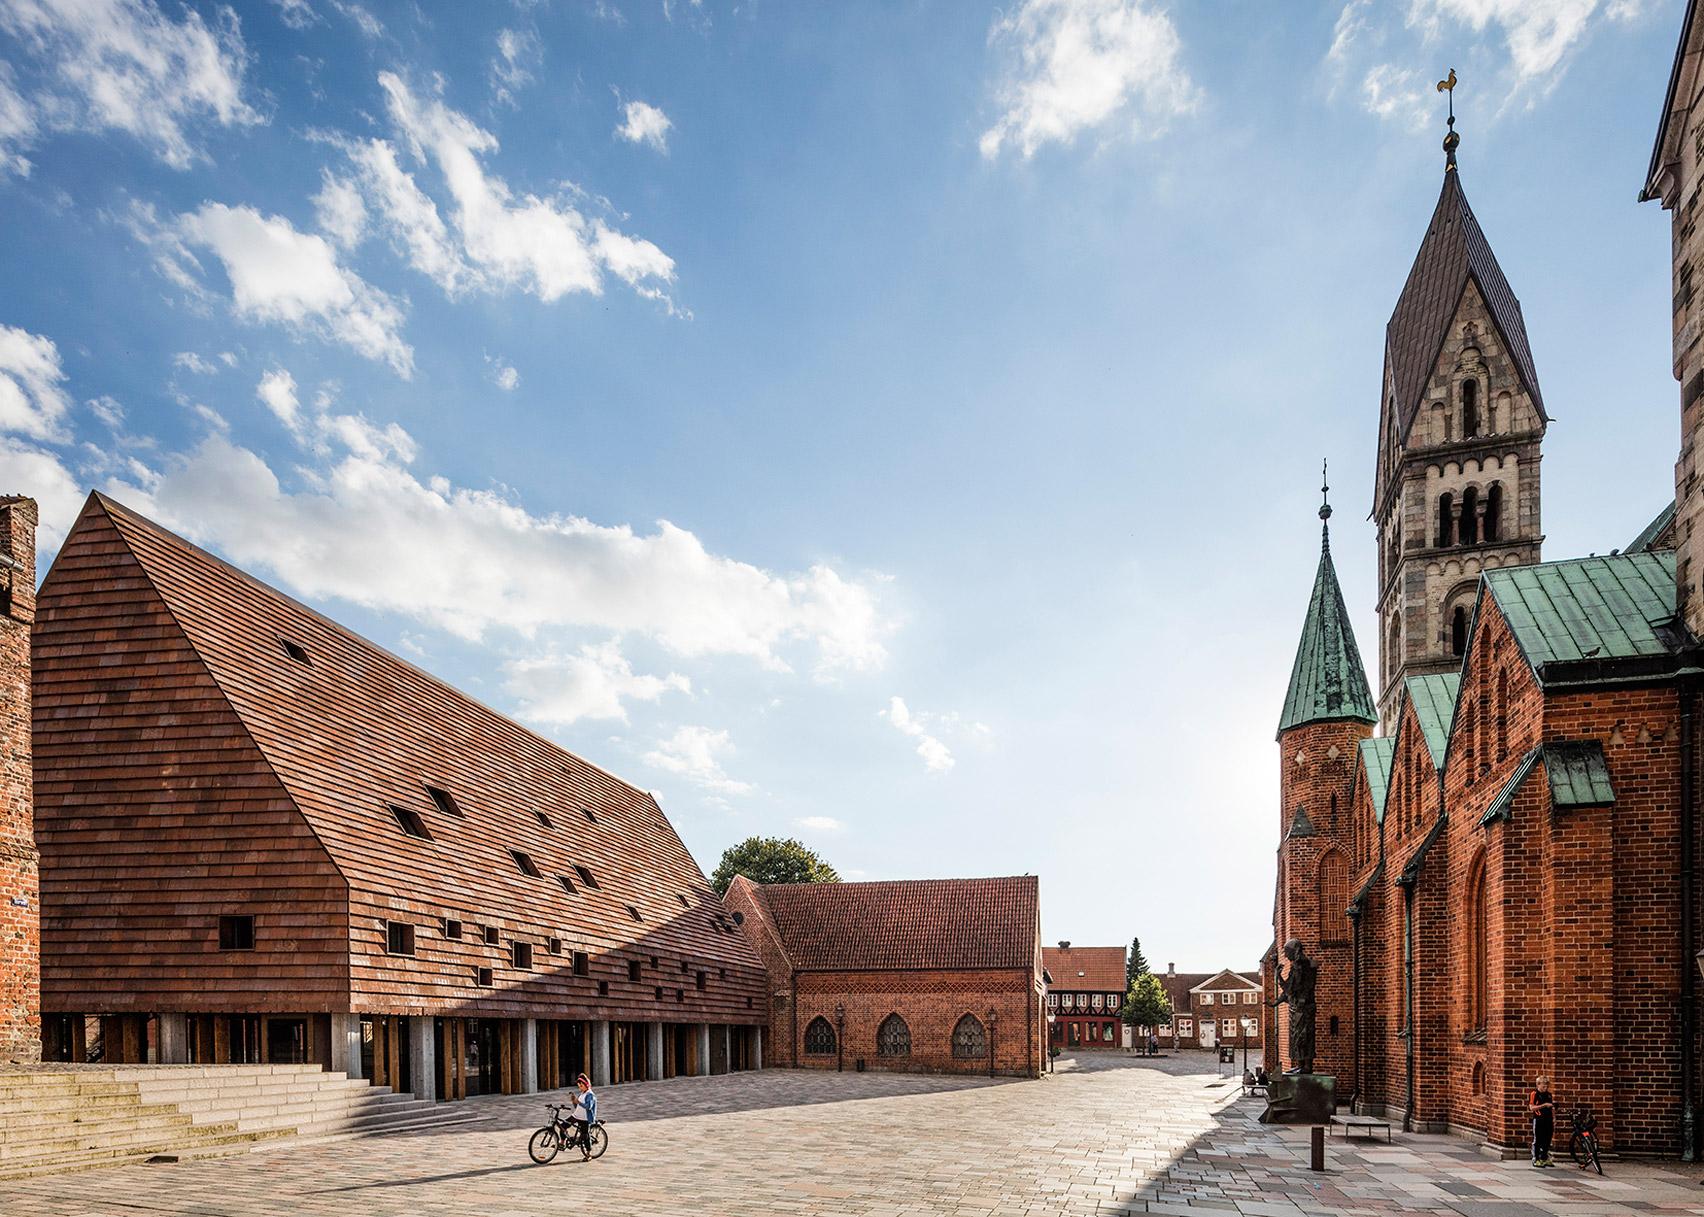 Kannikegården, Ribe, by Lundgaard & Tranberg Architects